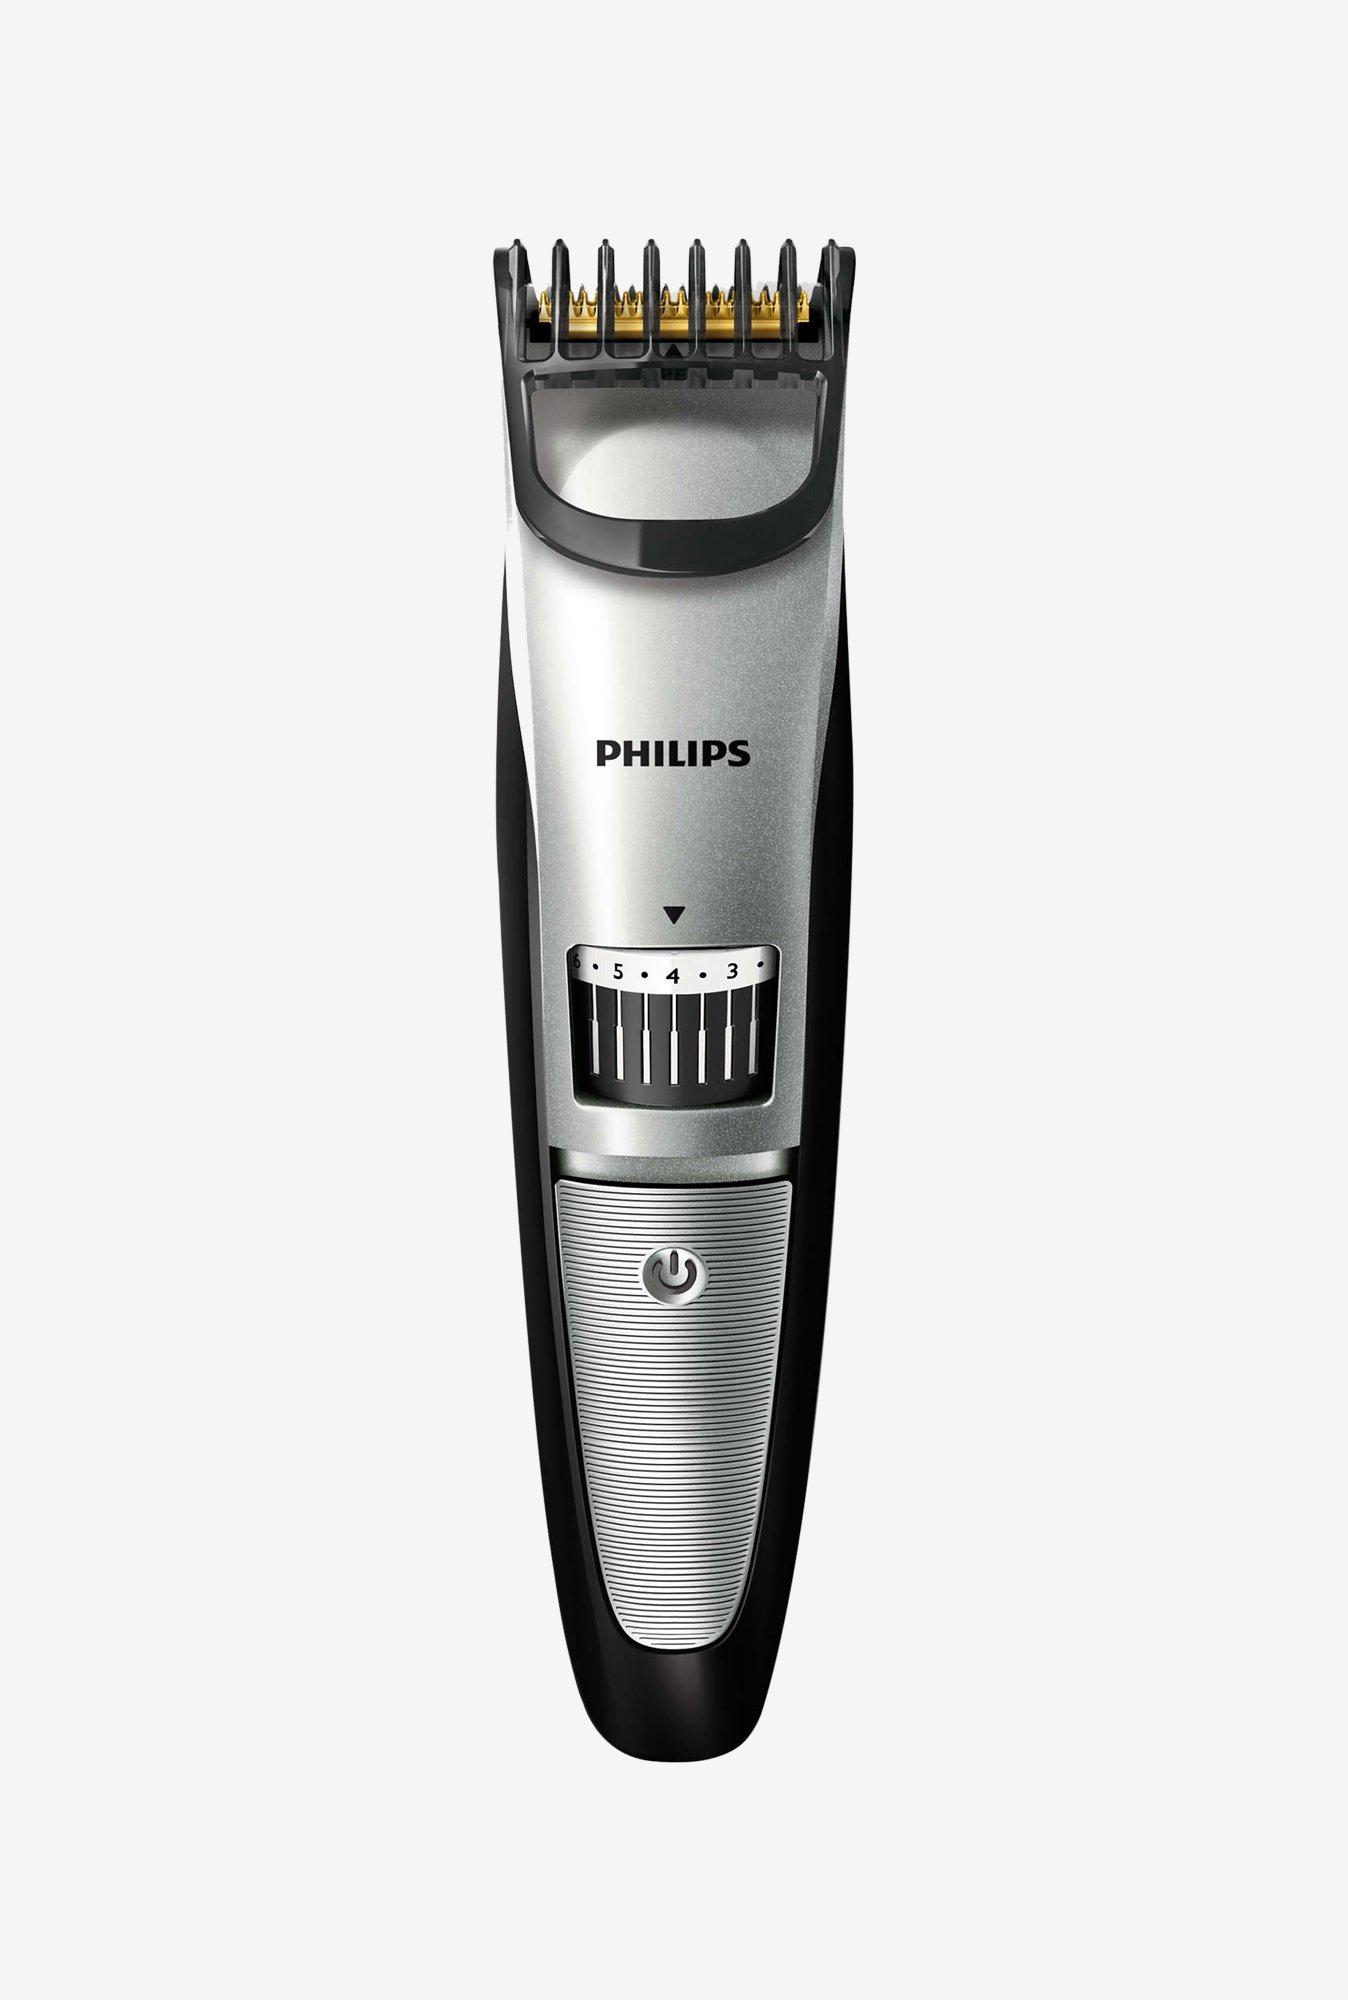 buy philips qt4018 15 pro skin advanced beard trimmer silver online at best price at tatacliq. Black Bedroom Furniture Sets. Home Design Ideas